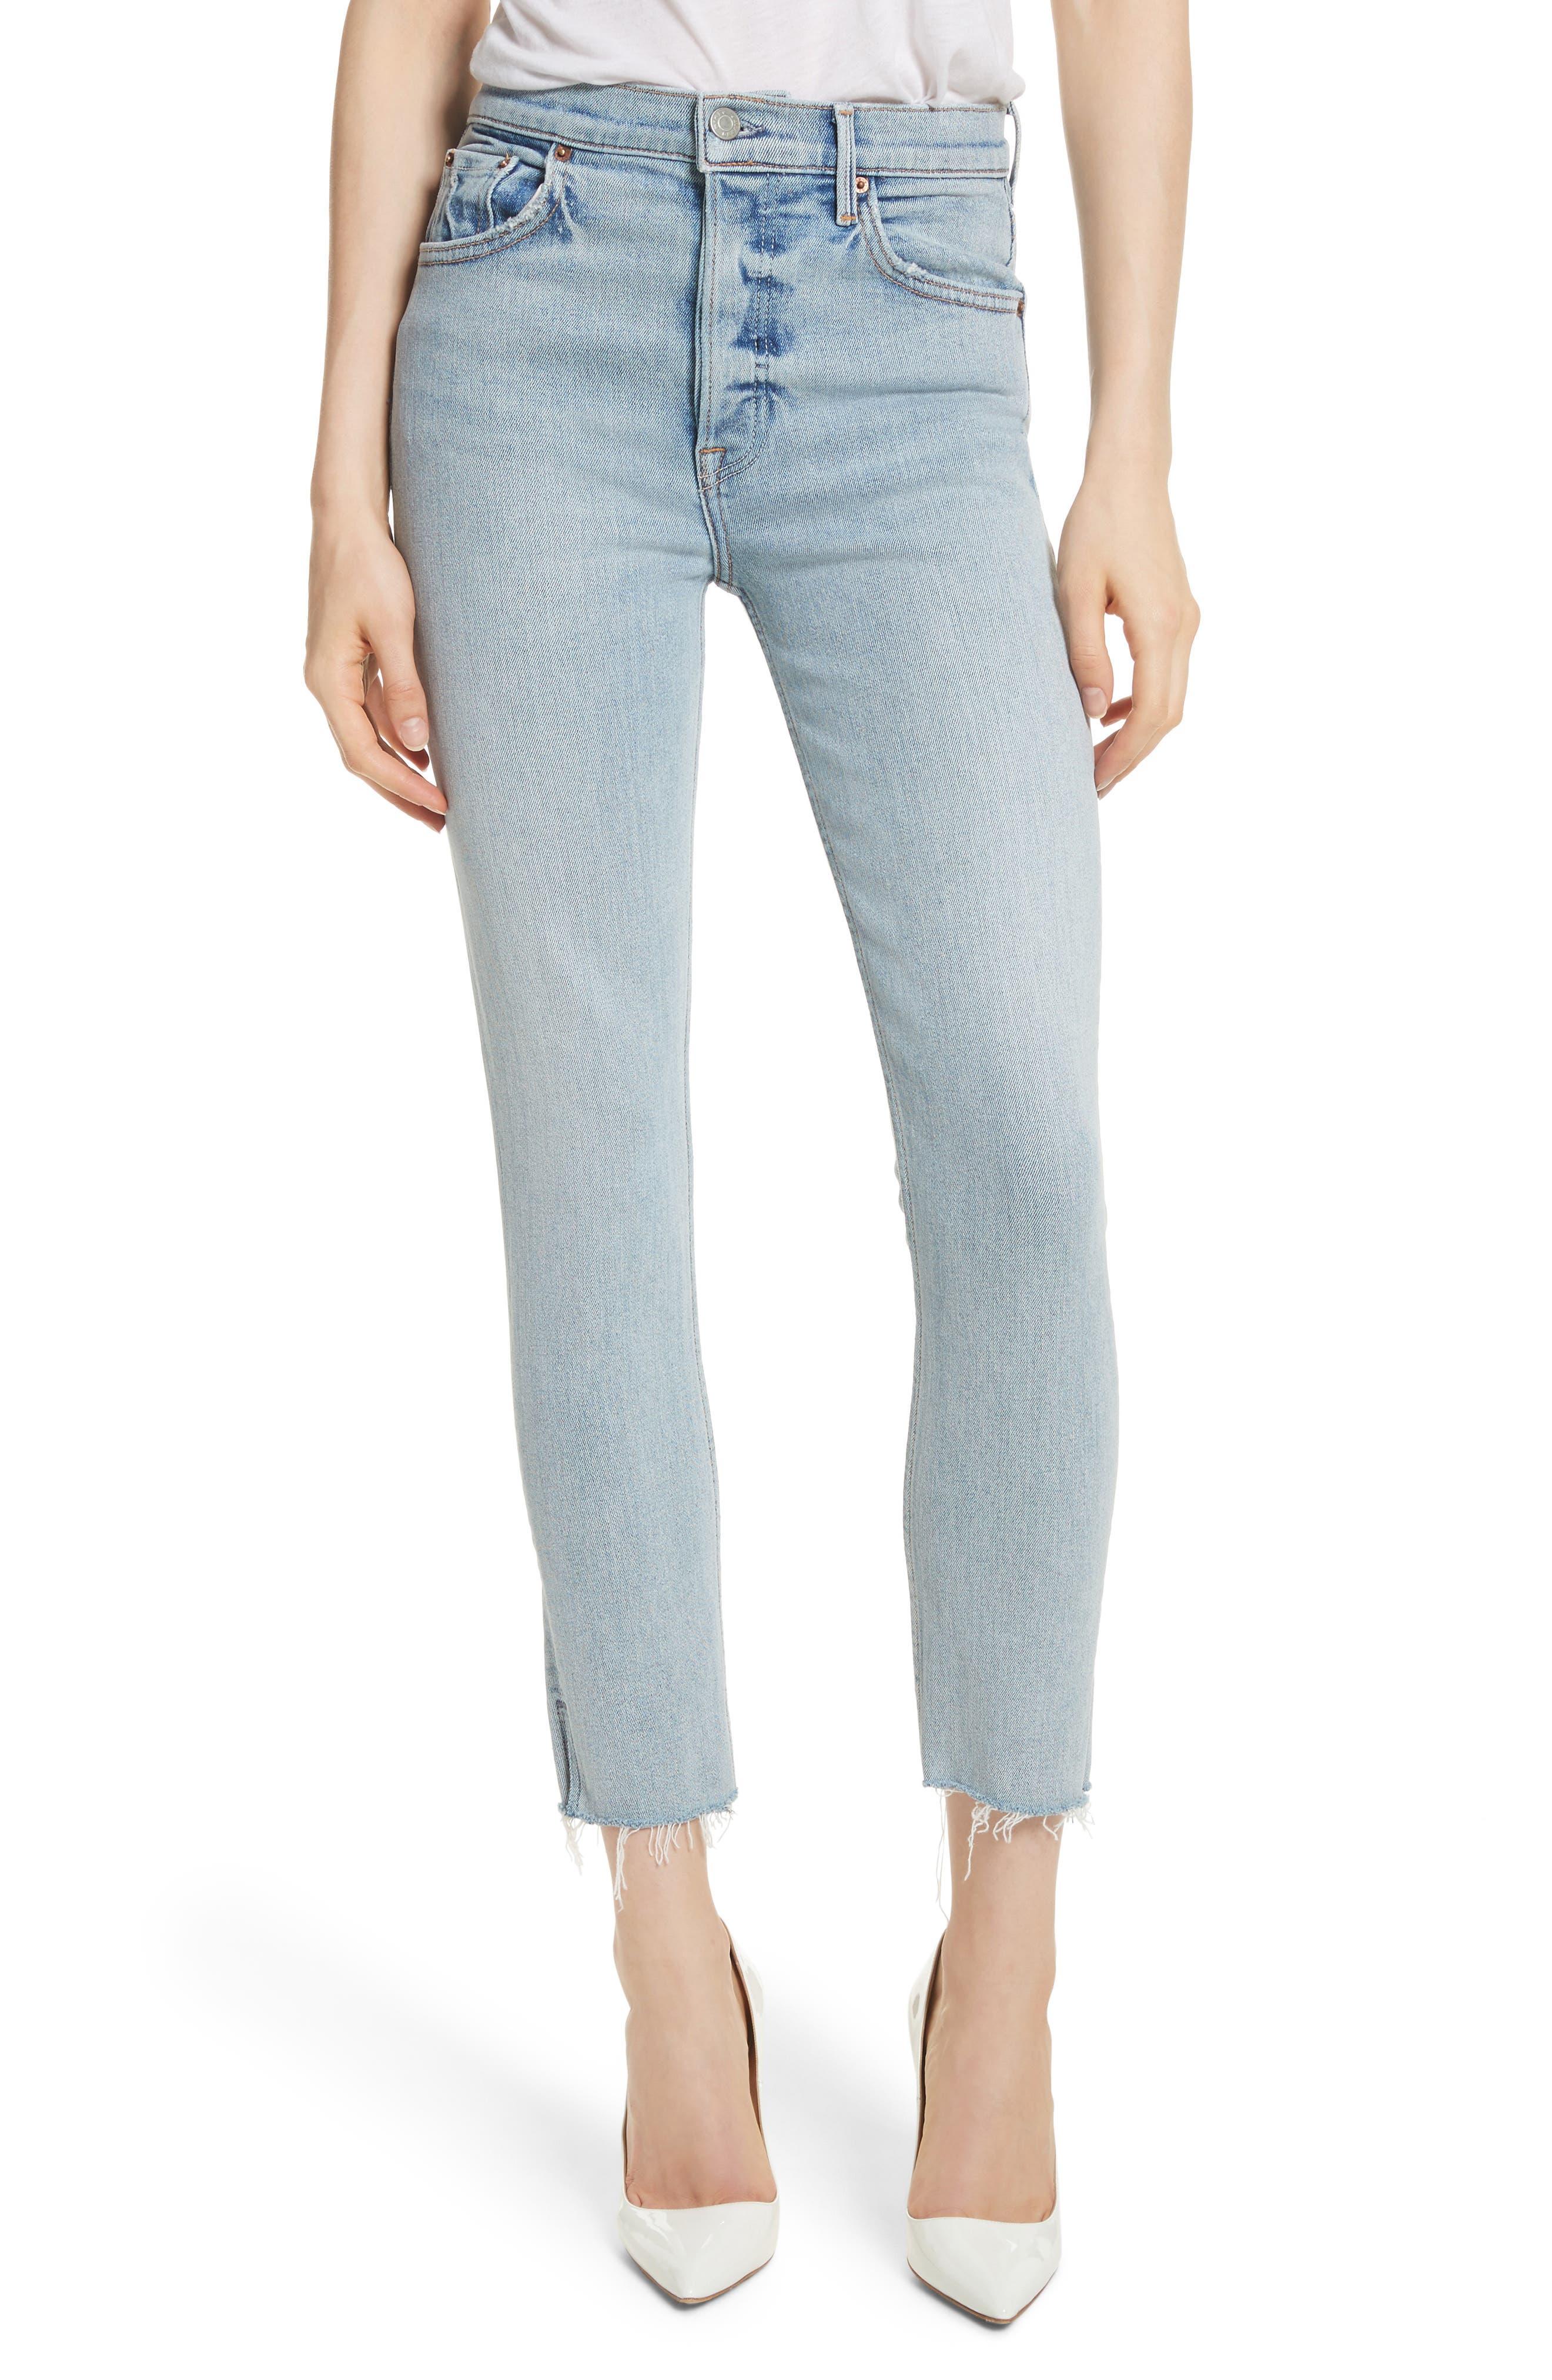 GRLFRND Karolina High Waist Skinny Jeans (Titanium)